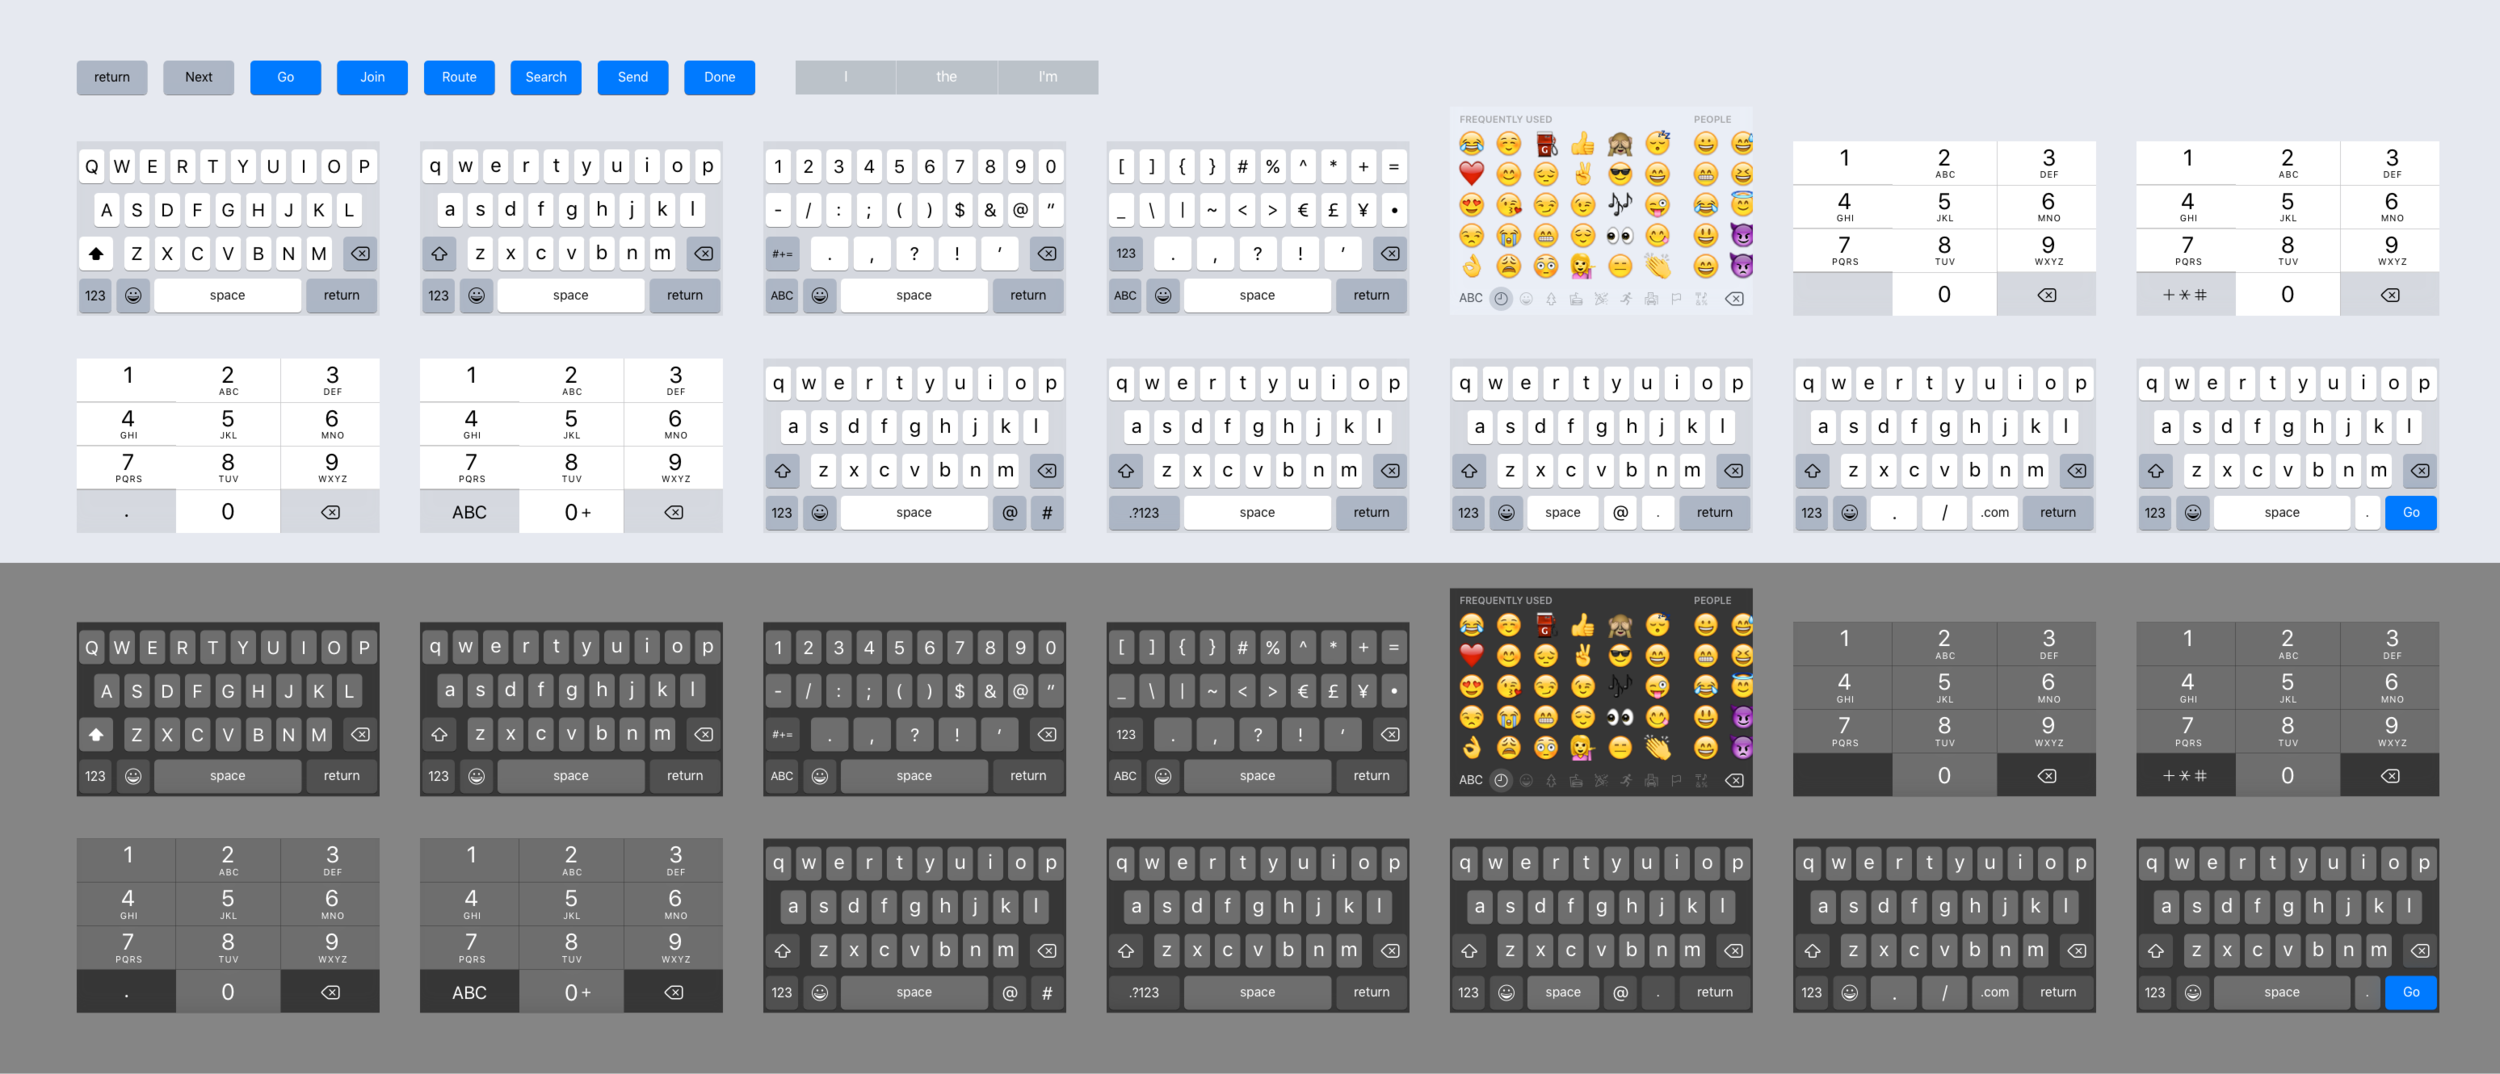 iPhone. Gotta love emojis.